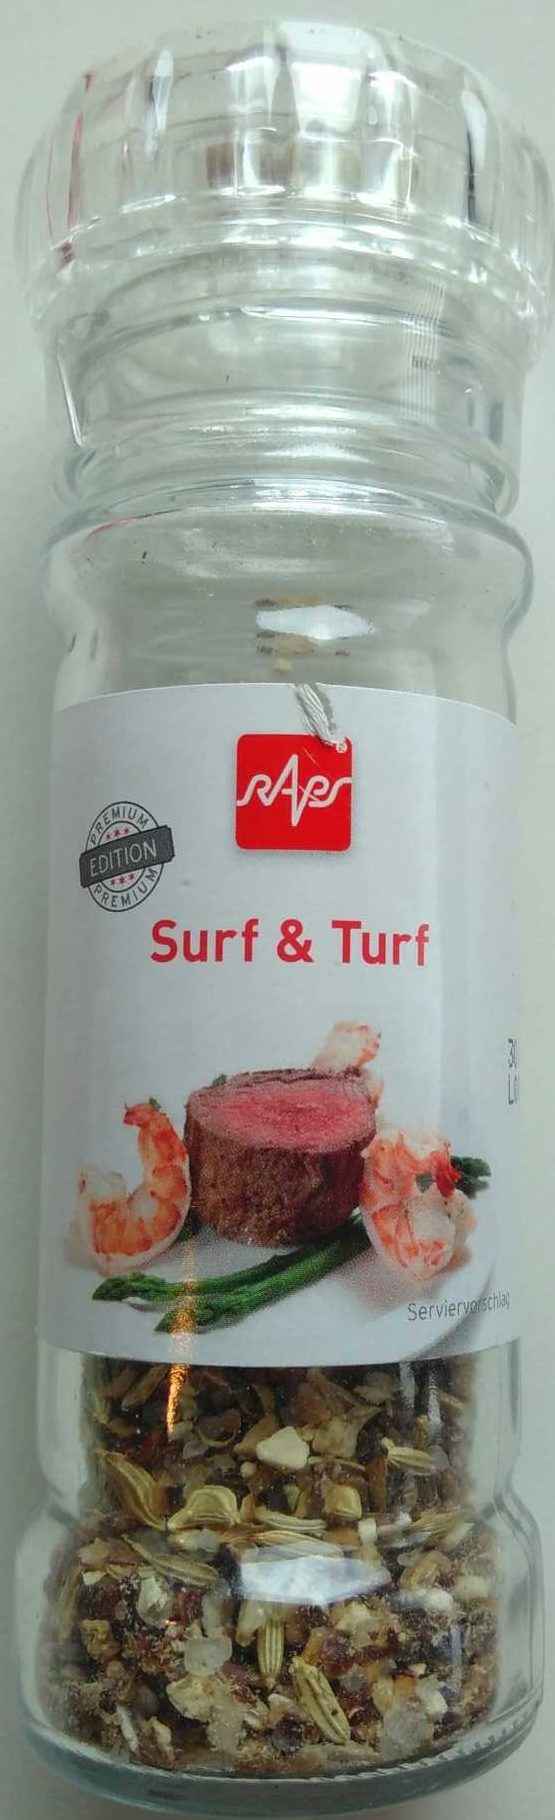 Surf & Turf - Produit